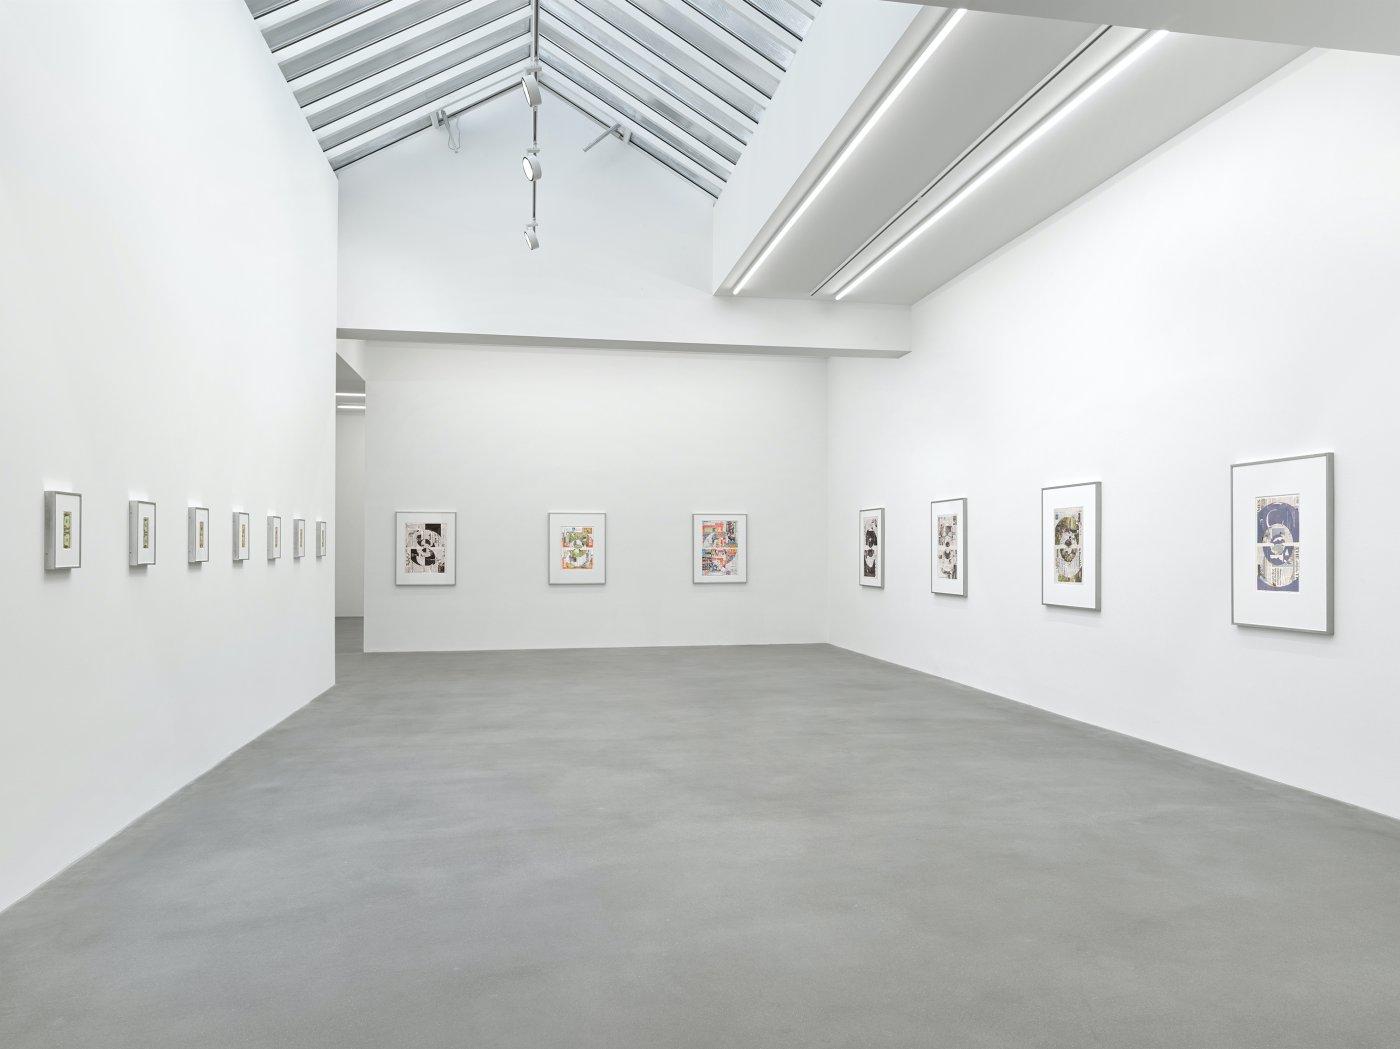 Galerie Eva Presenhuber Waldmanstrasse Walead Beshty 6